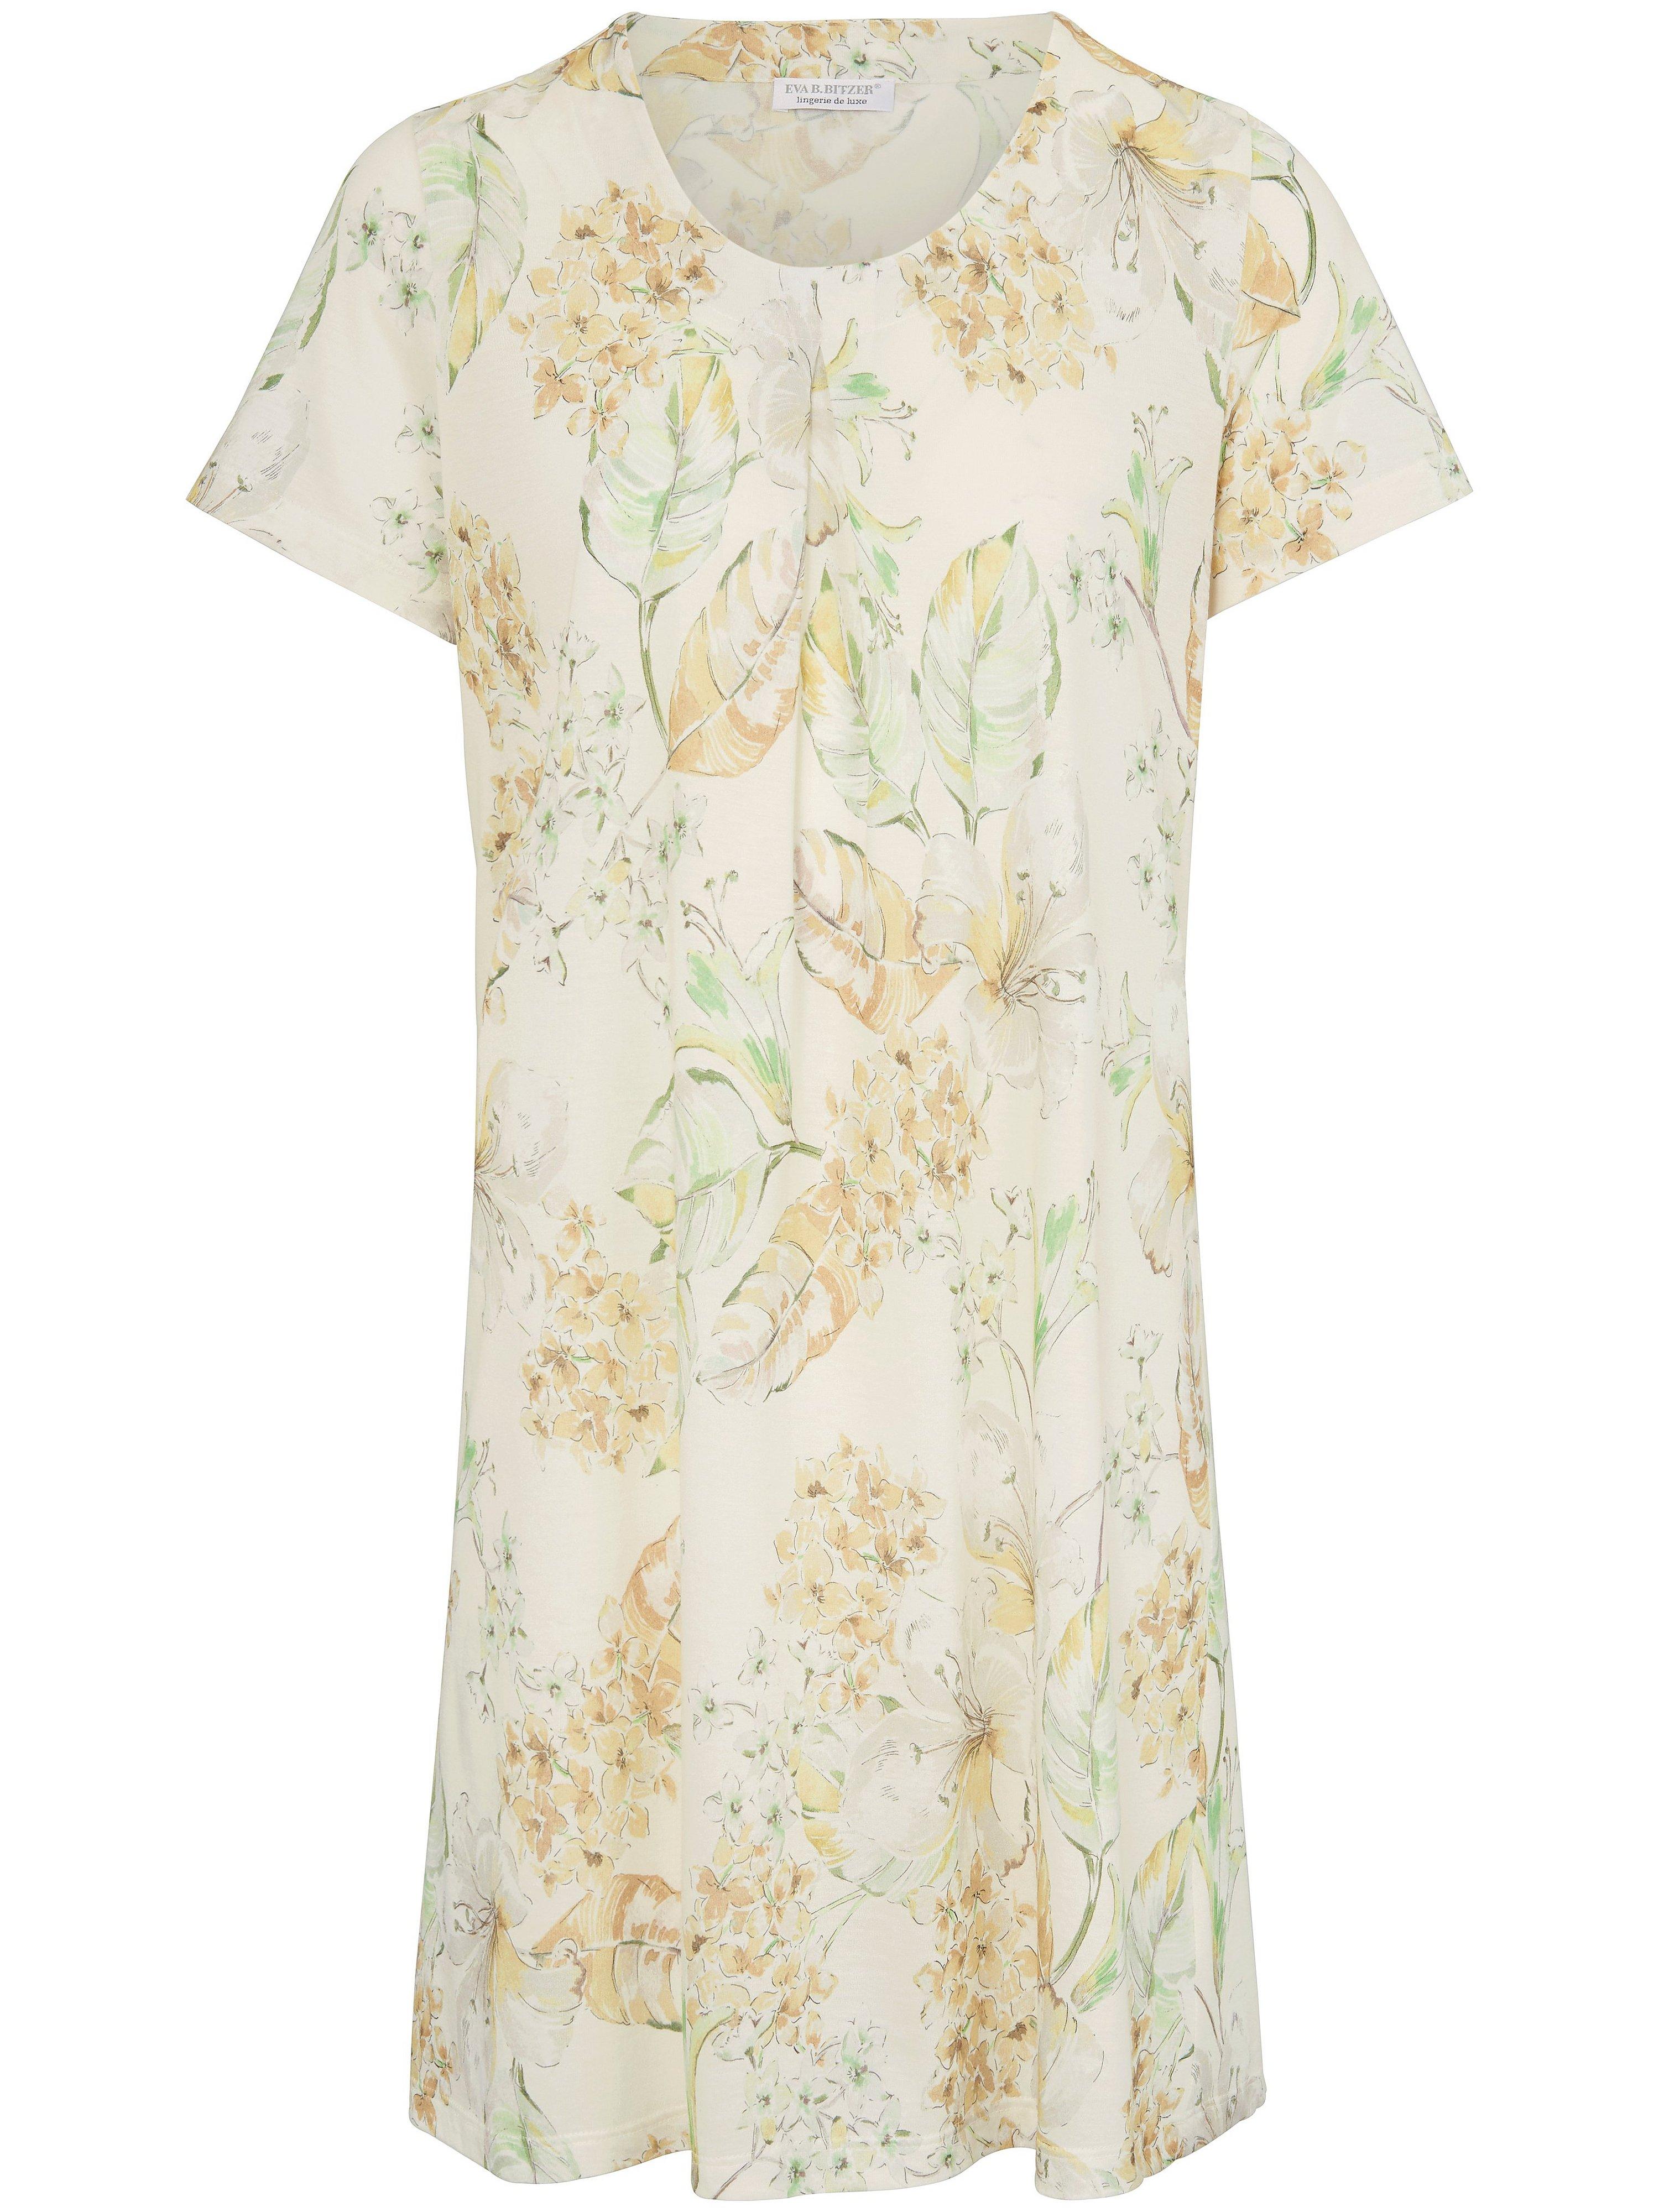 La chemise nuit manches courtes  Eva B. Bitzer jaune taille 40